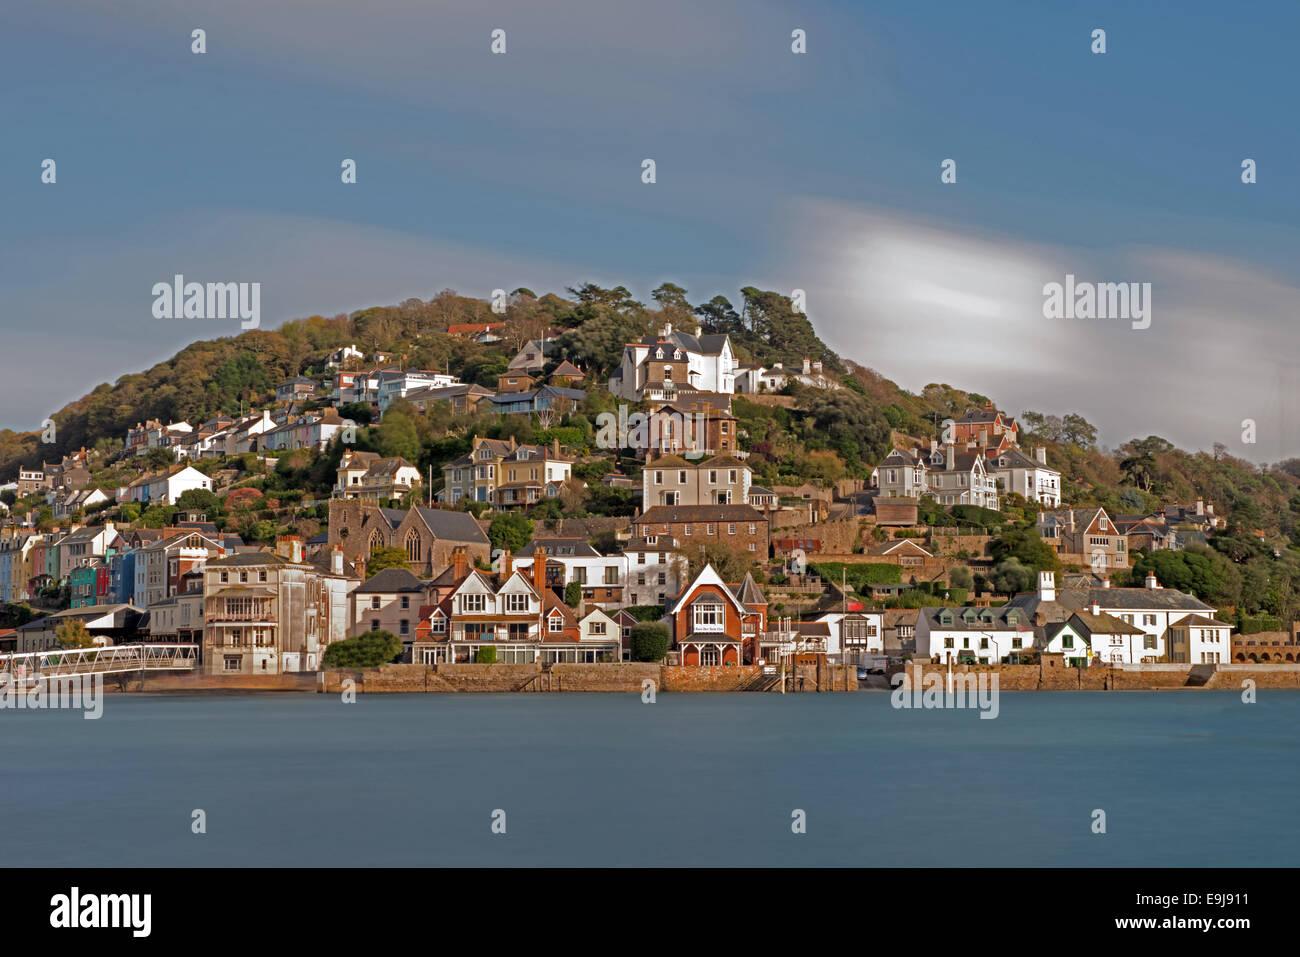 Looking across to Kingswear From Dartmouth, Devon, England, Uk - Stock Image